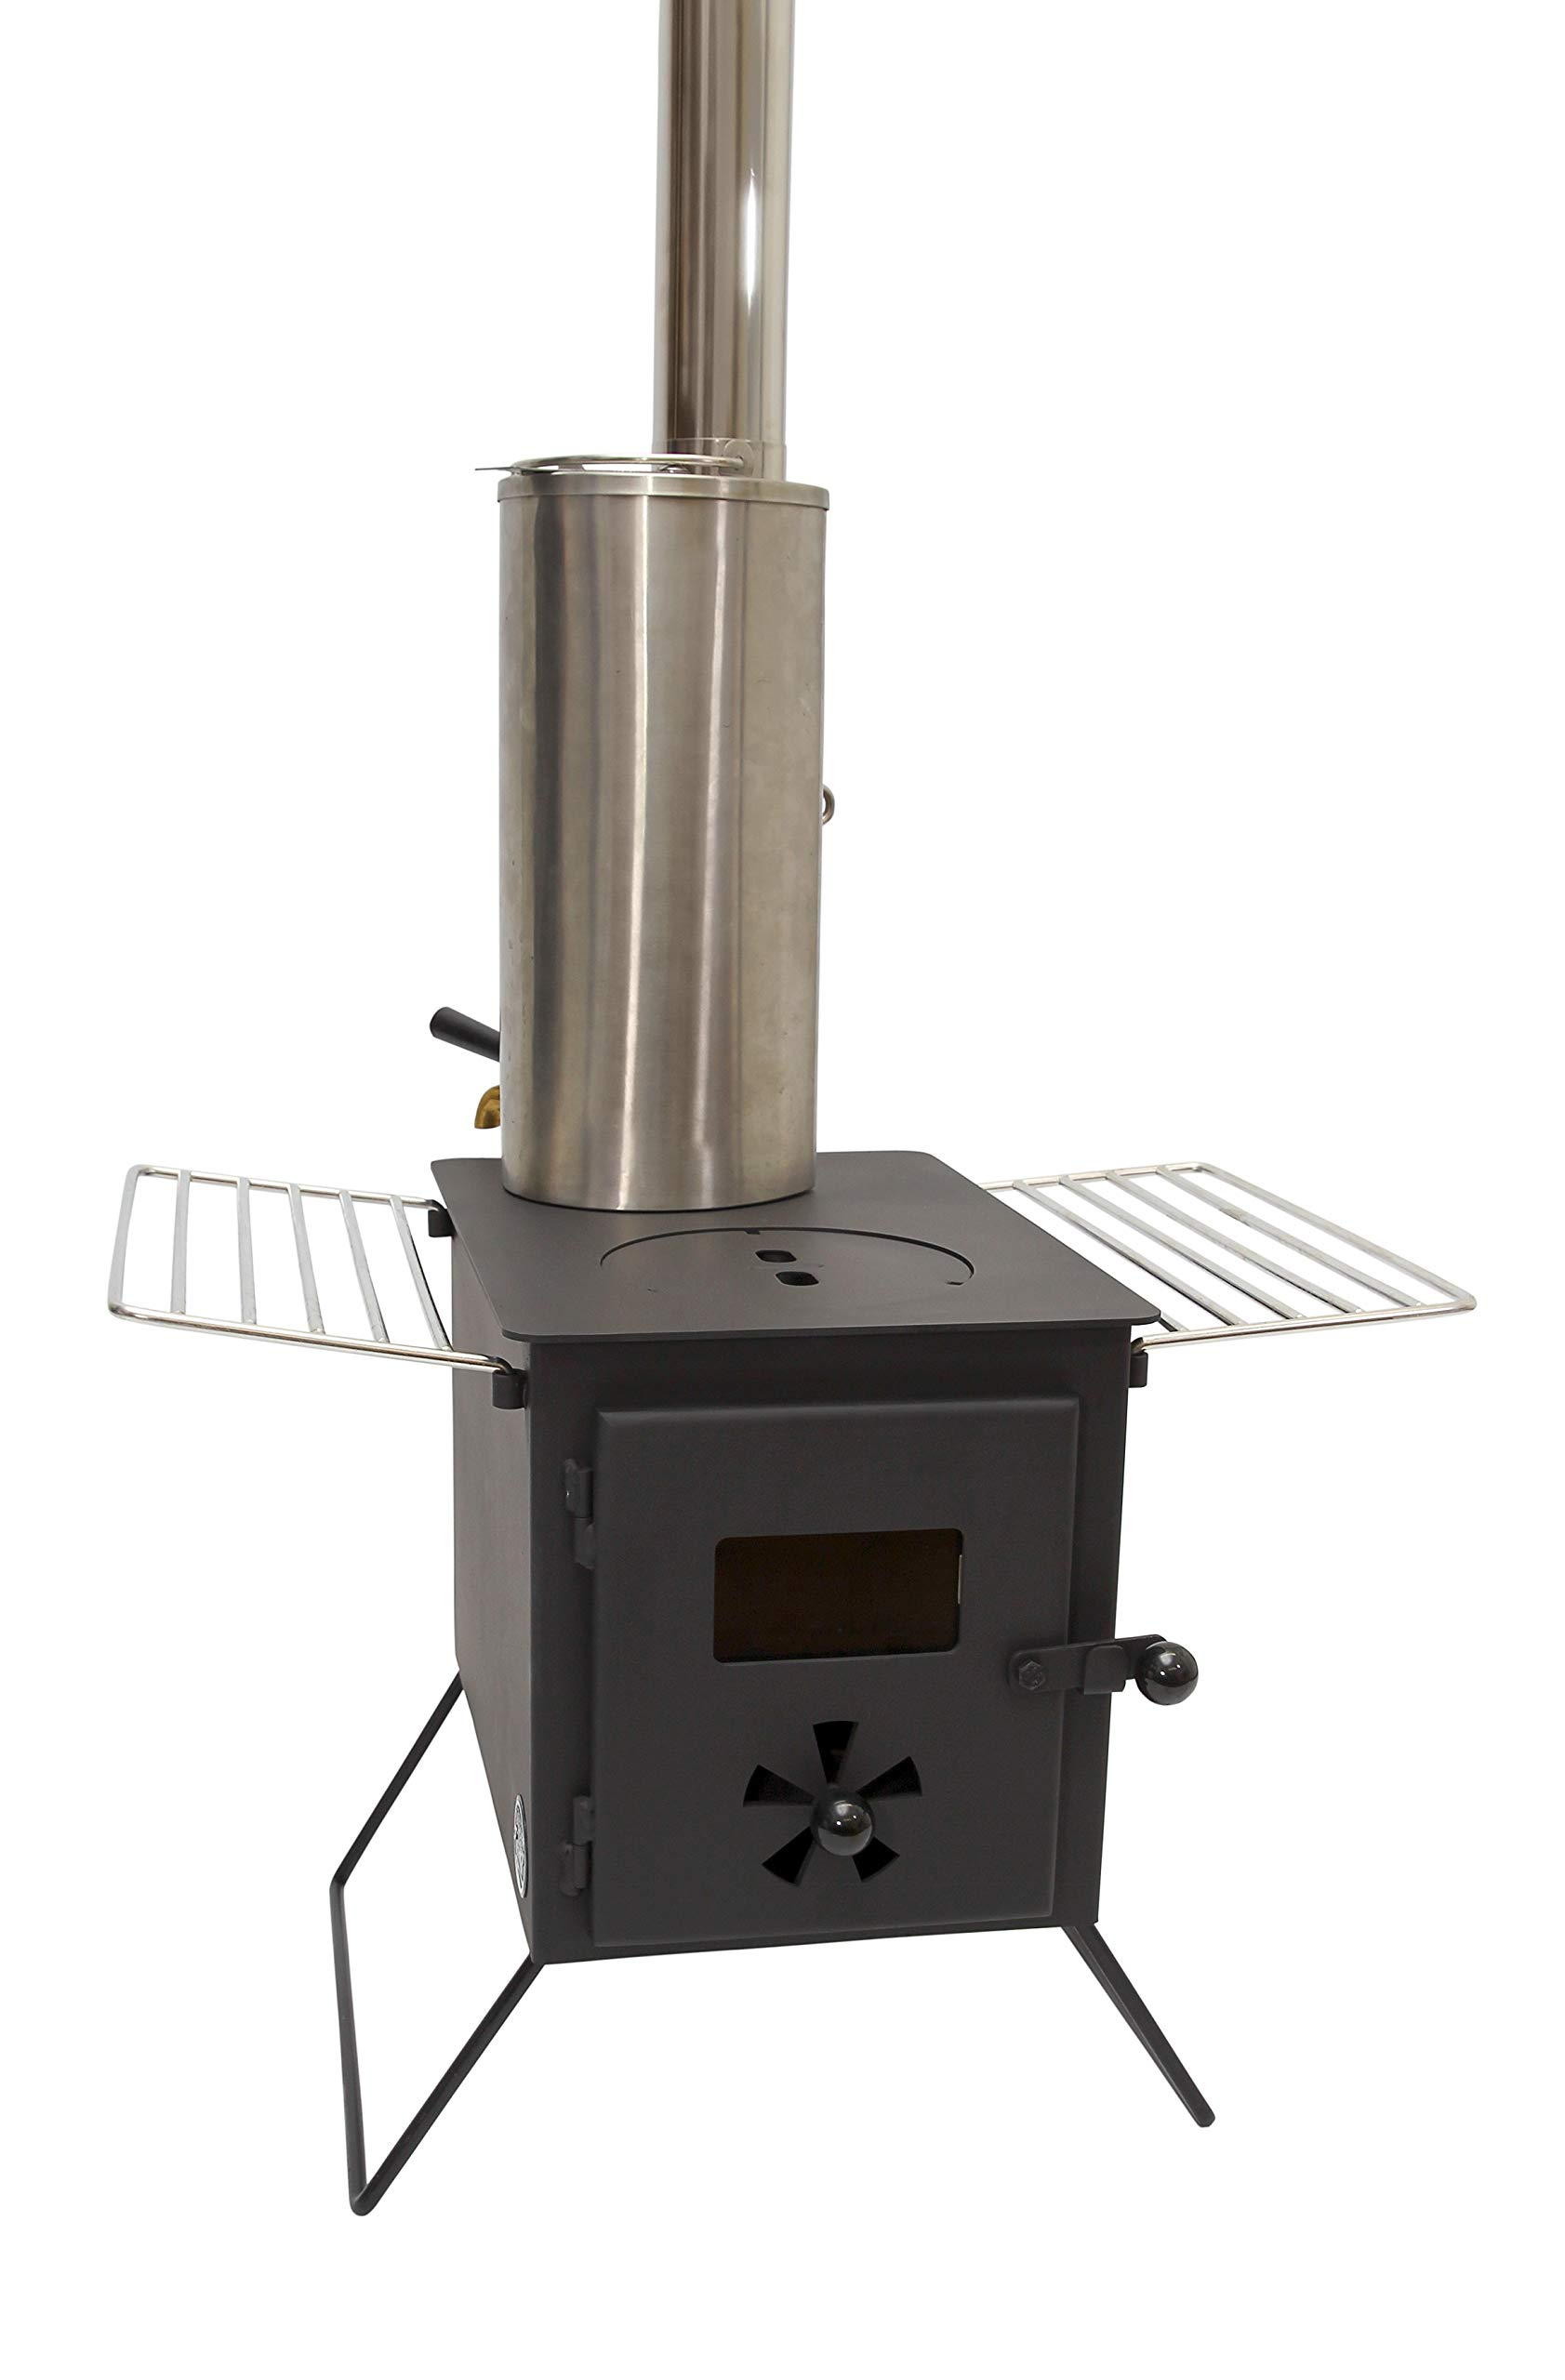 Outbacker 'Firebox' Portable Wood Burning Stove 5